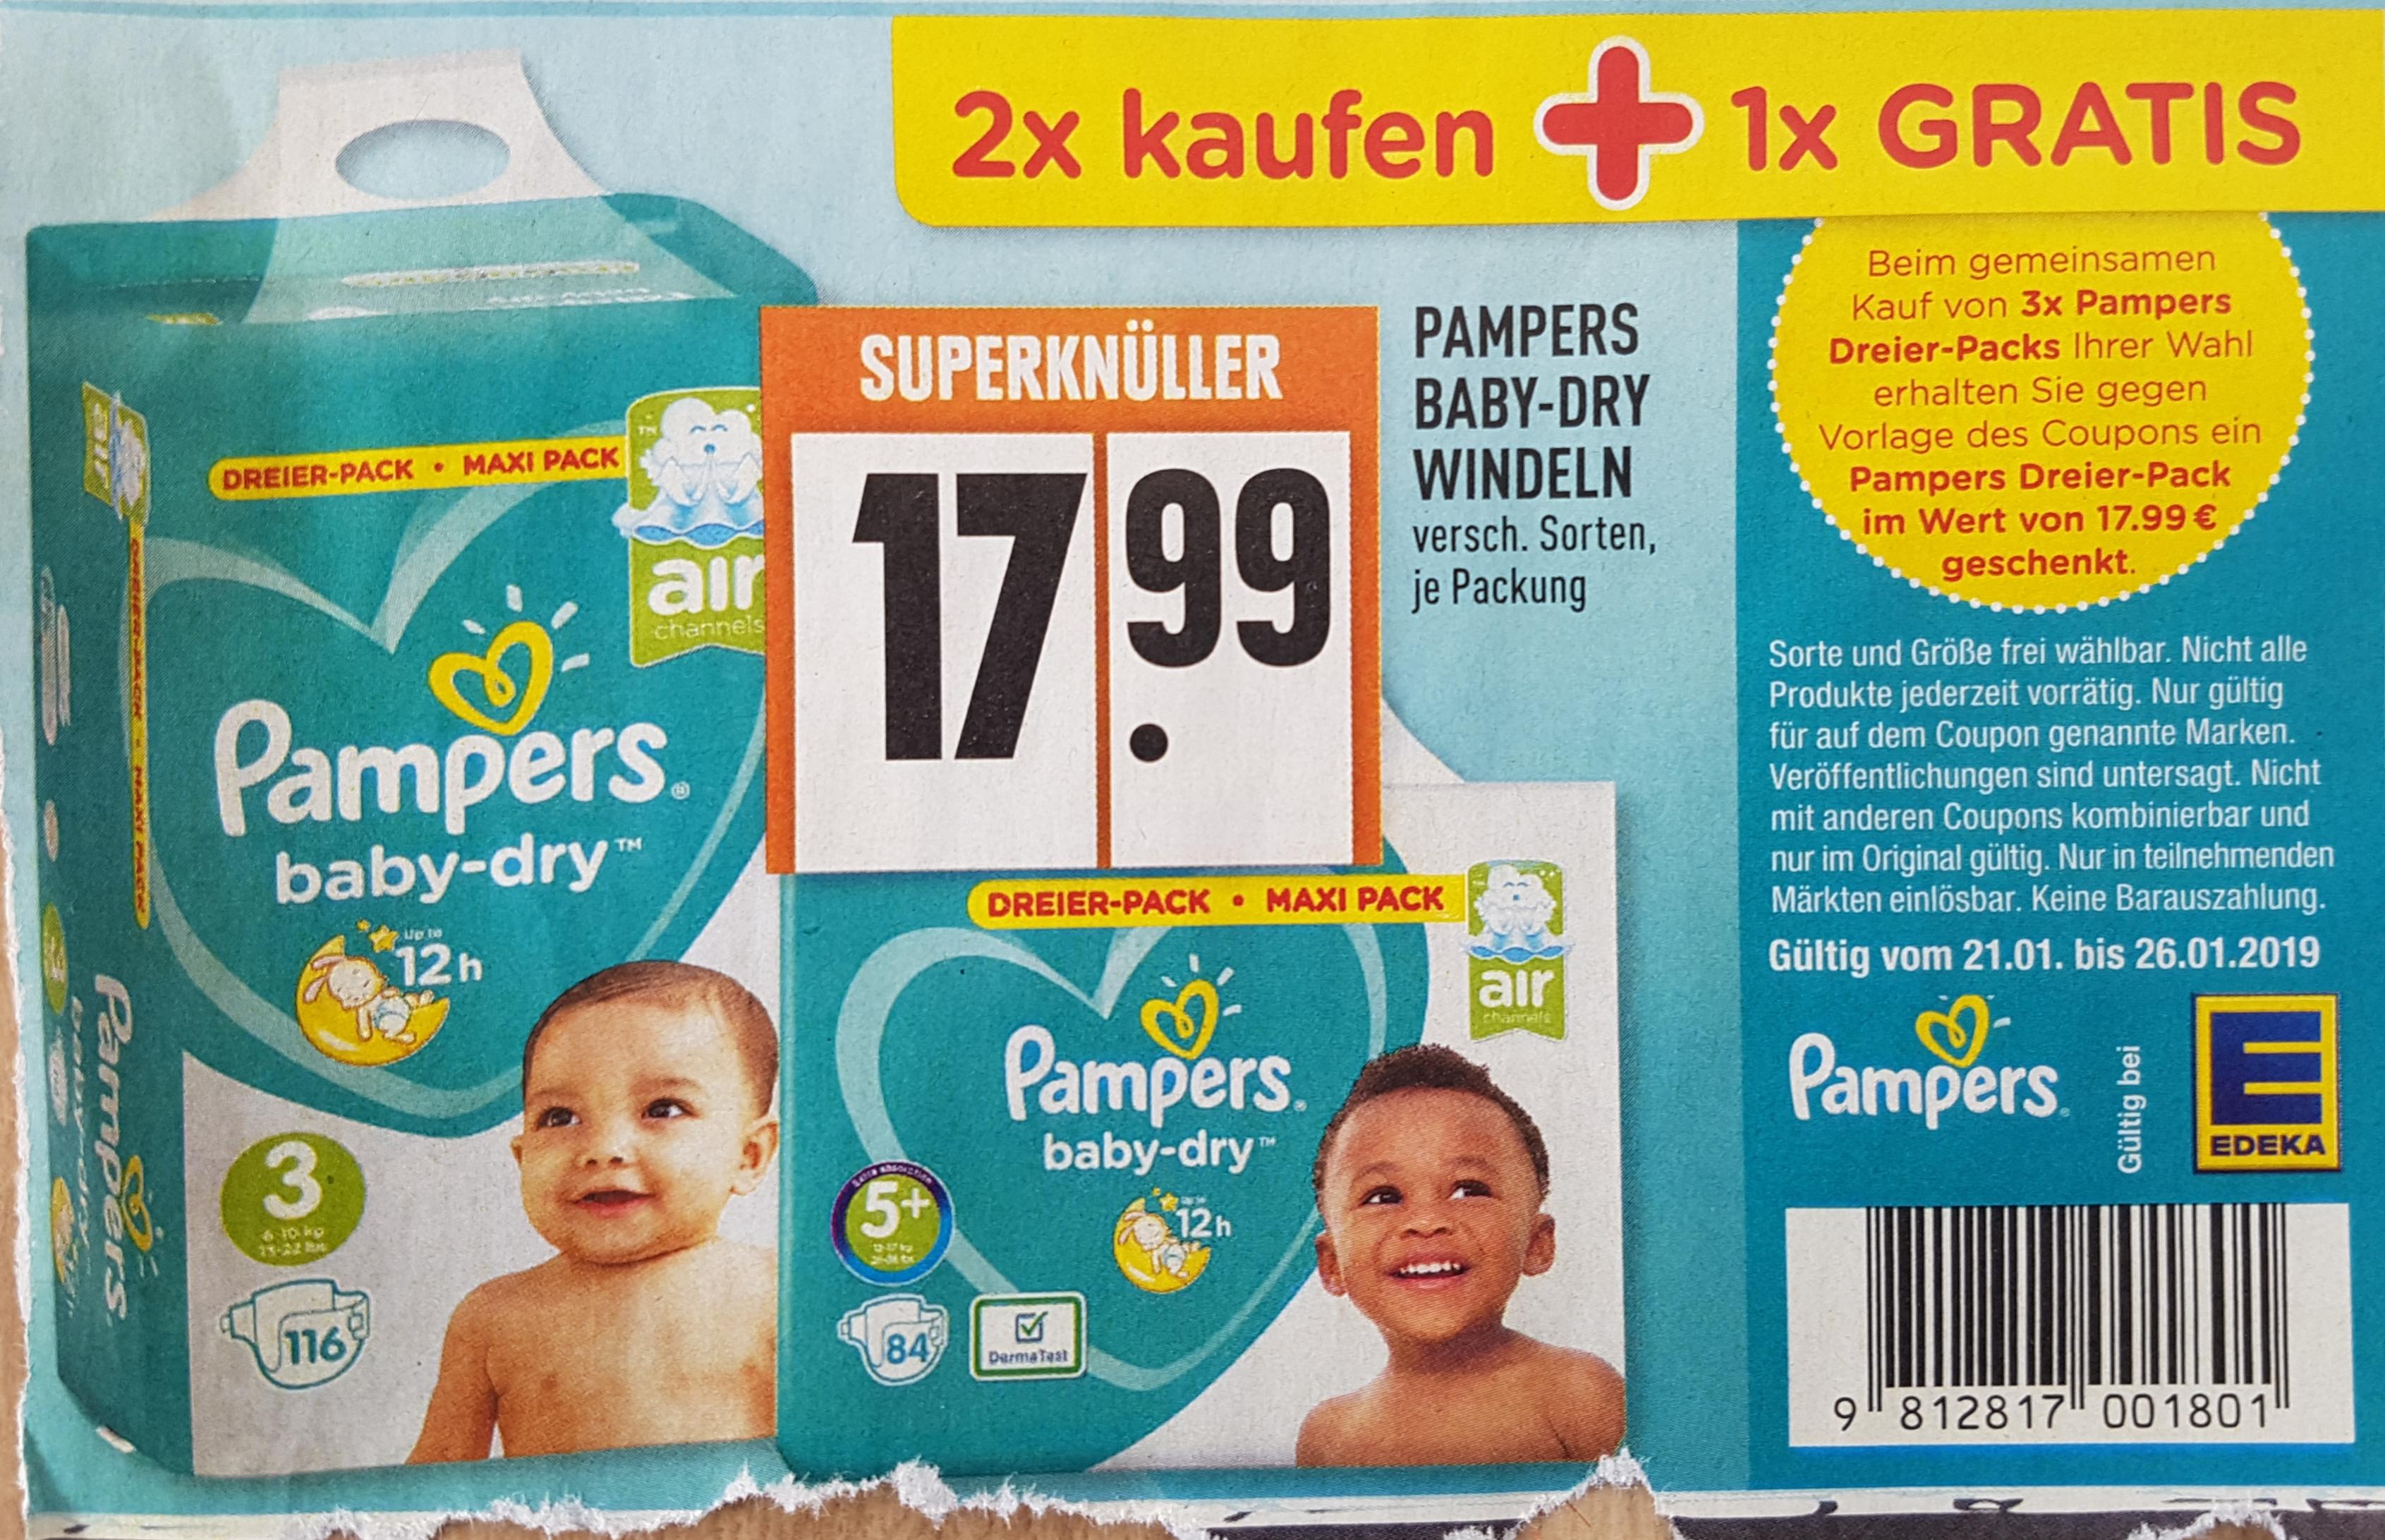 Pampers Baby-Dry 3 mal Dreierpack bei Edeka bundesweit